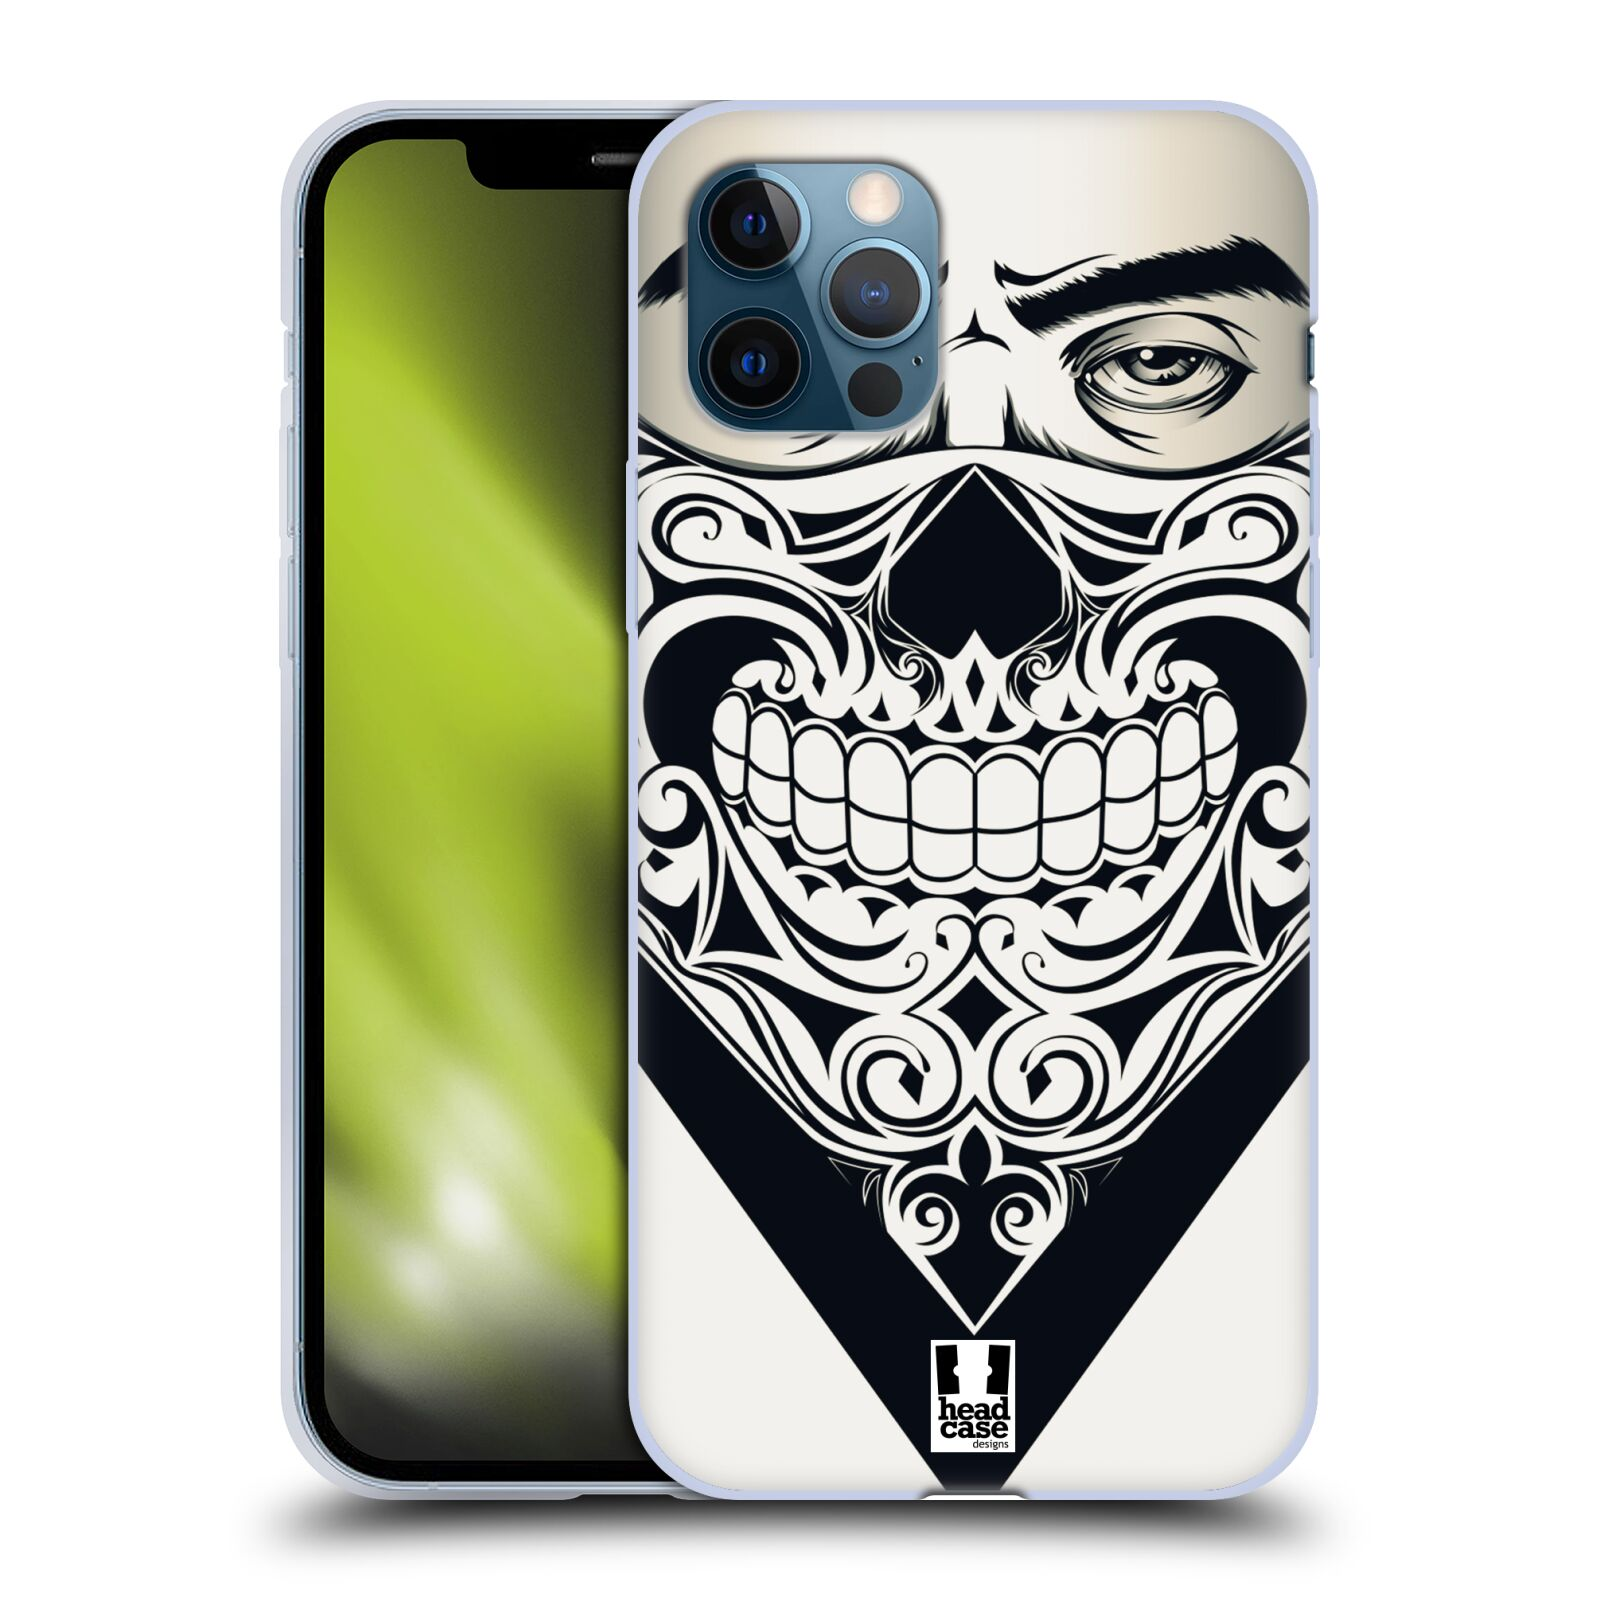 Silikonové pouzdro na mobil Apple iPhone 12 / 12 Pro - Head Case - LEBKA BANDANA